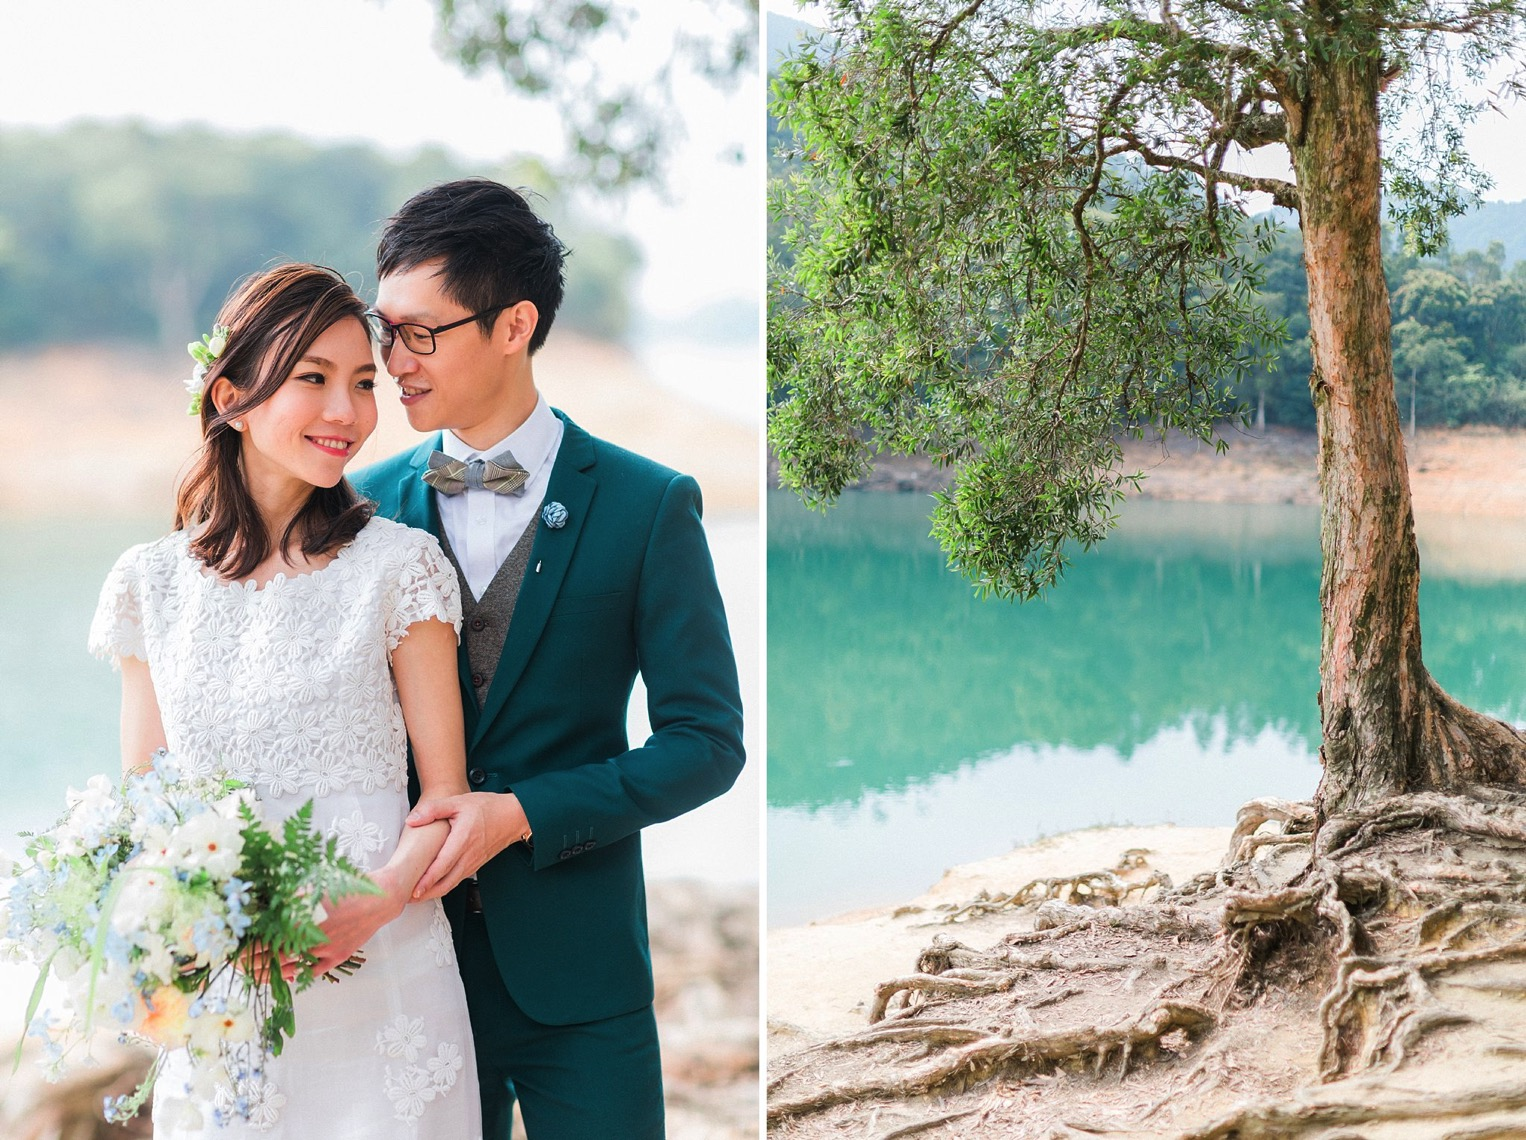 French Grey Photography Hong Kong Prewedding216